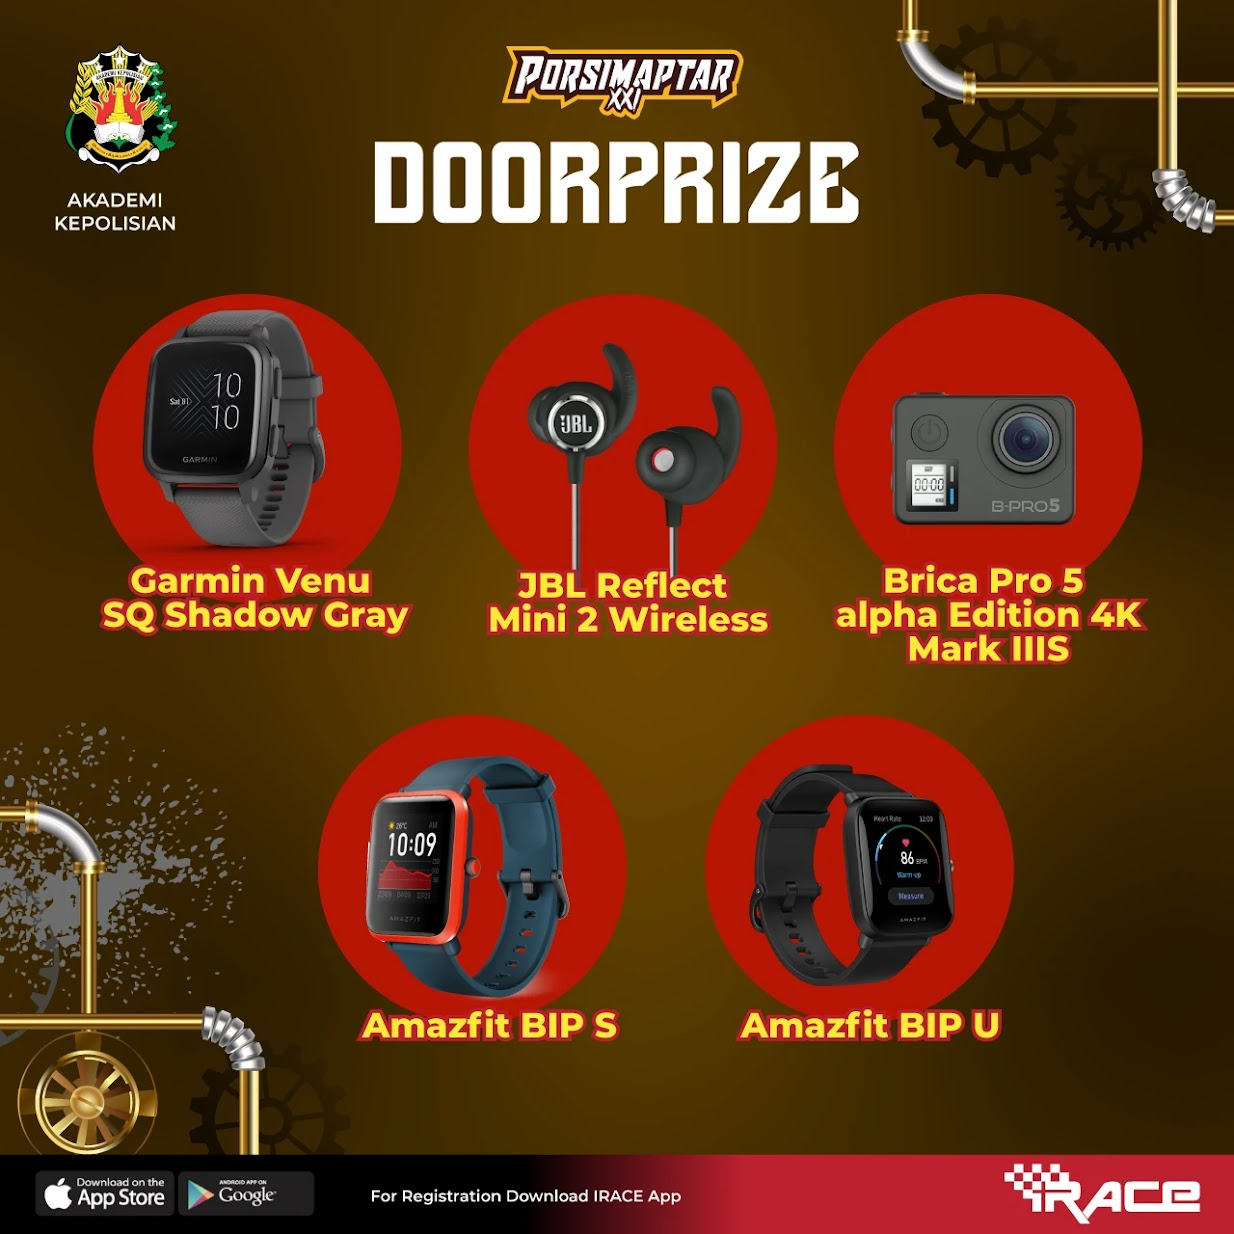 Doorprize � Porsimaptar Virtual Run XXI • 2021